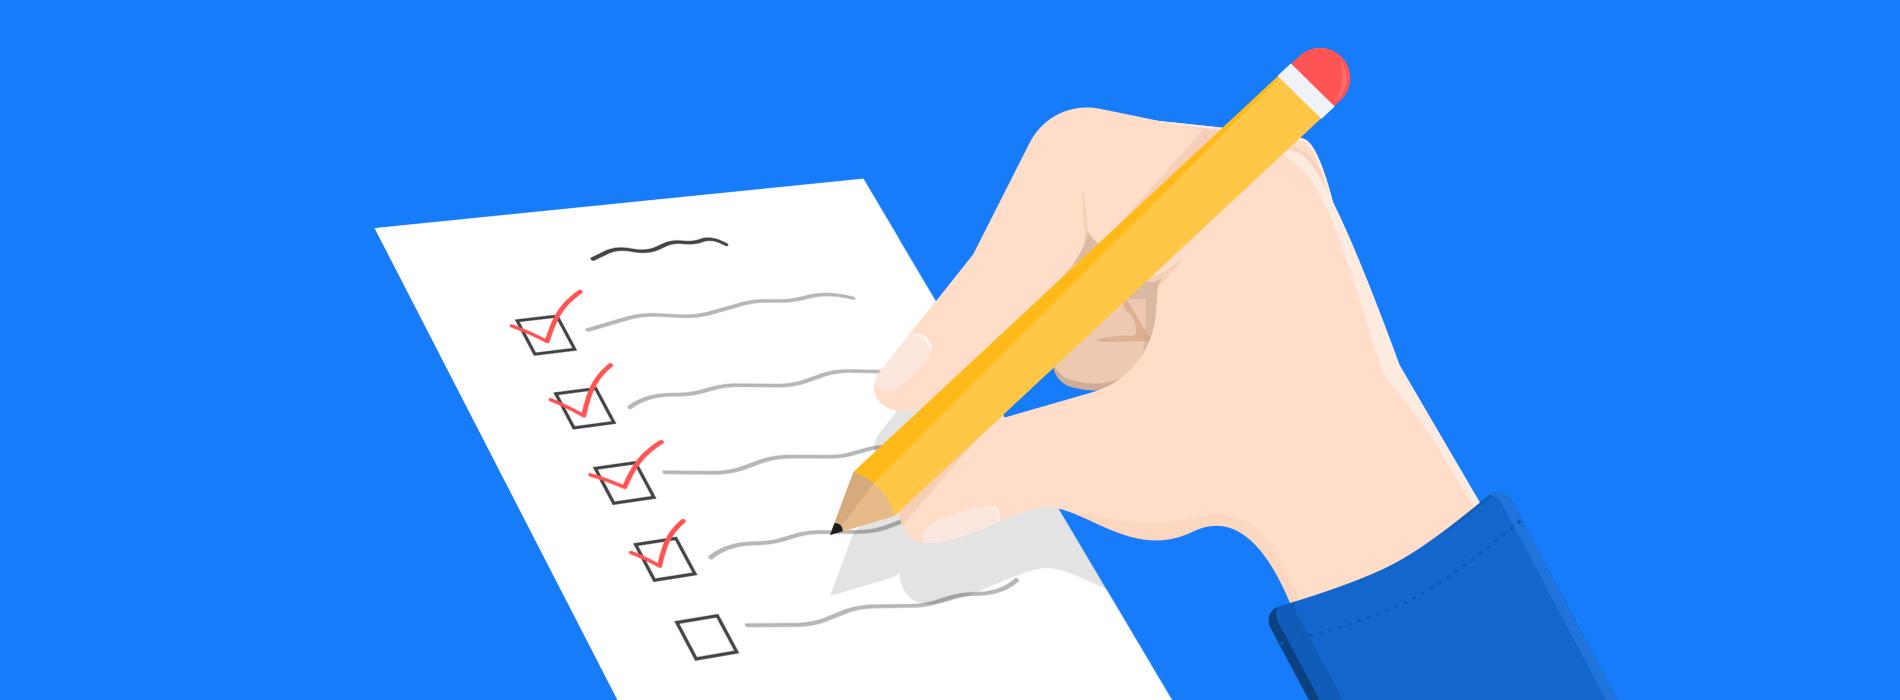 The Ecommerce Customer Journey Checklist